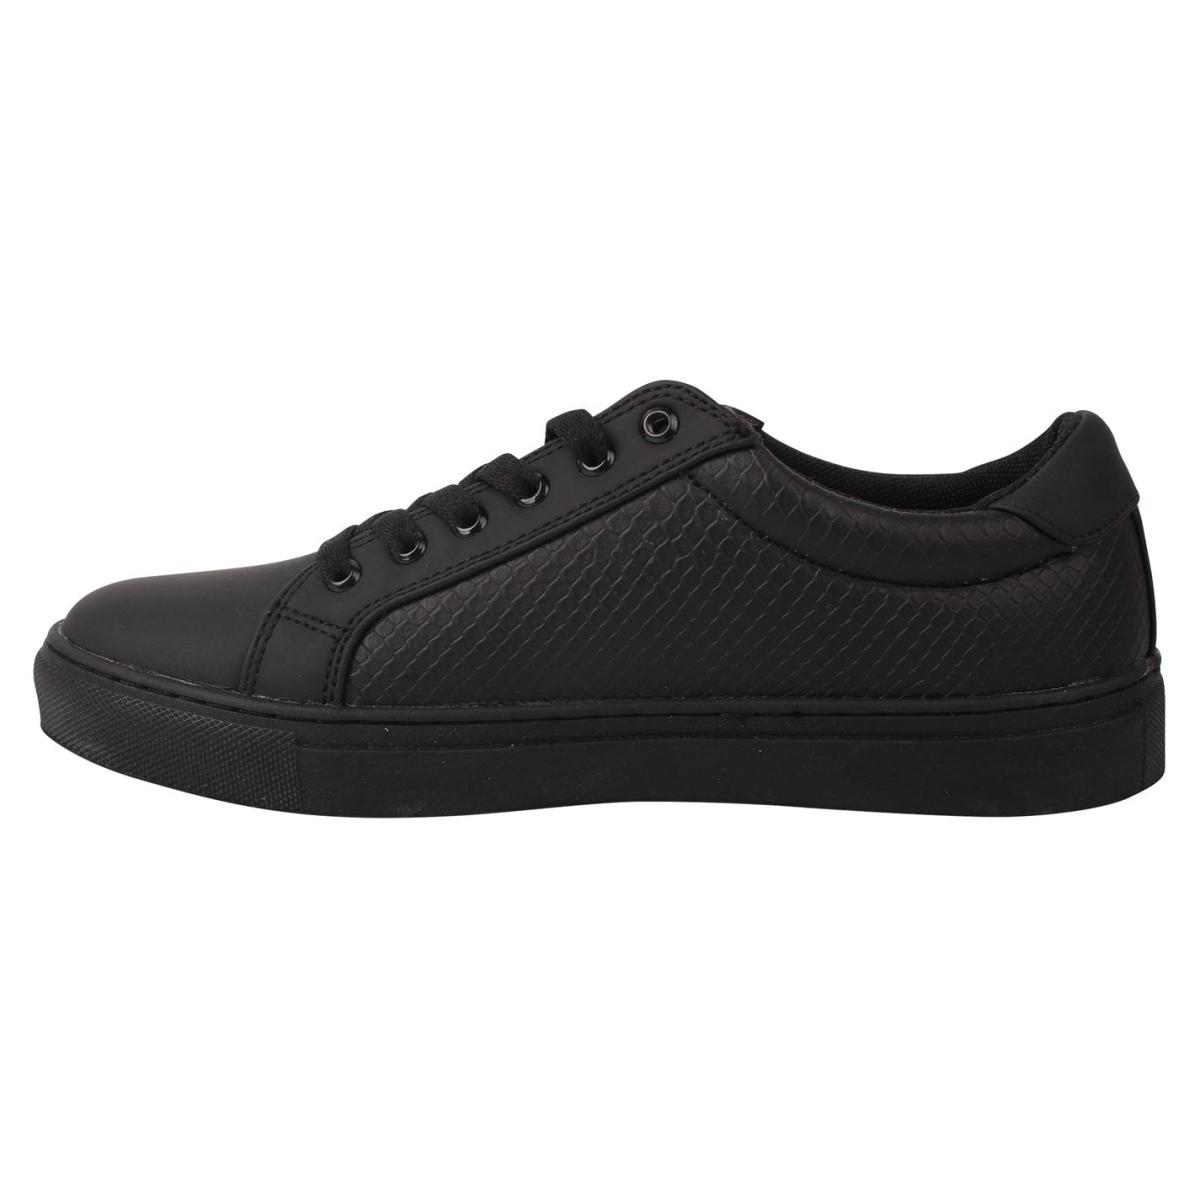 Fabric-Aruna-Lace-Turnschuhe-Laufschuhe-Damen-Sportschuhe-Sneaker-4869 Indexbild 4